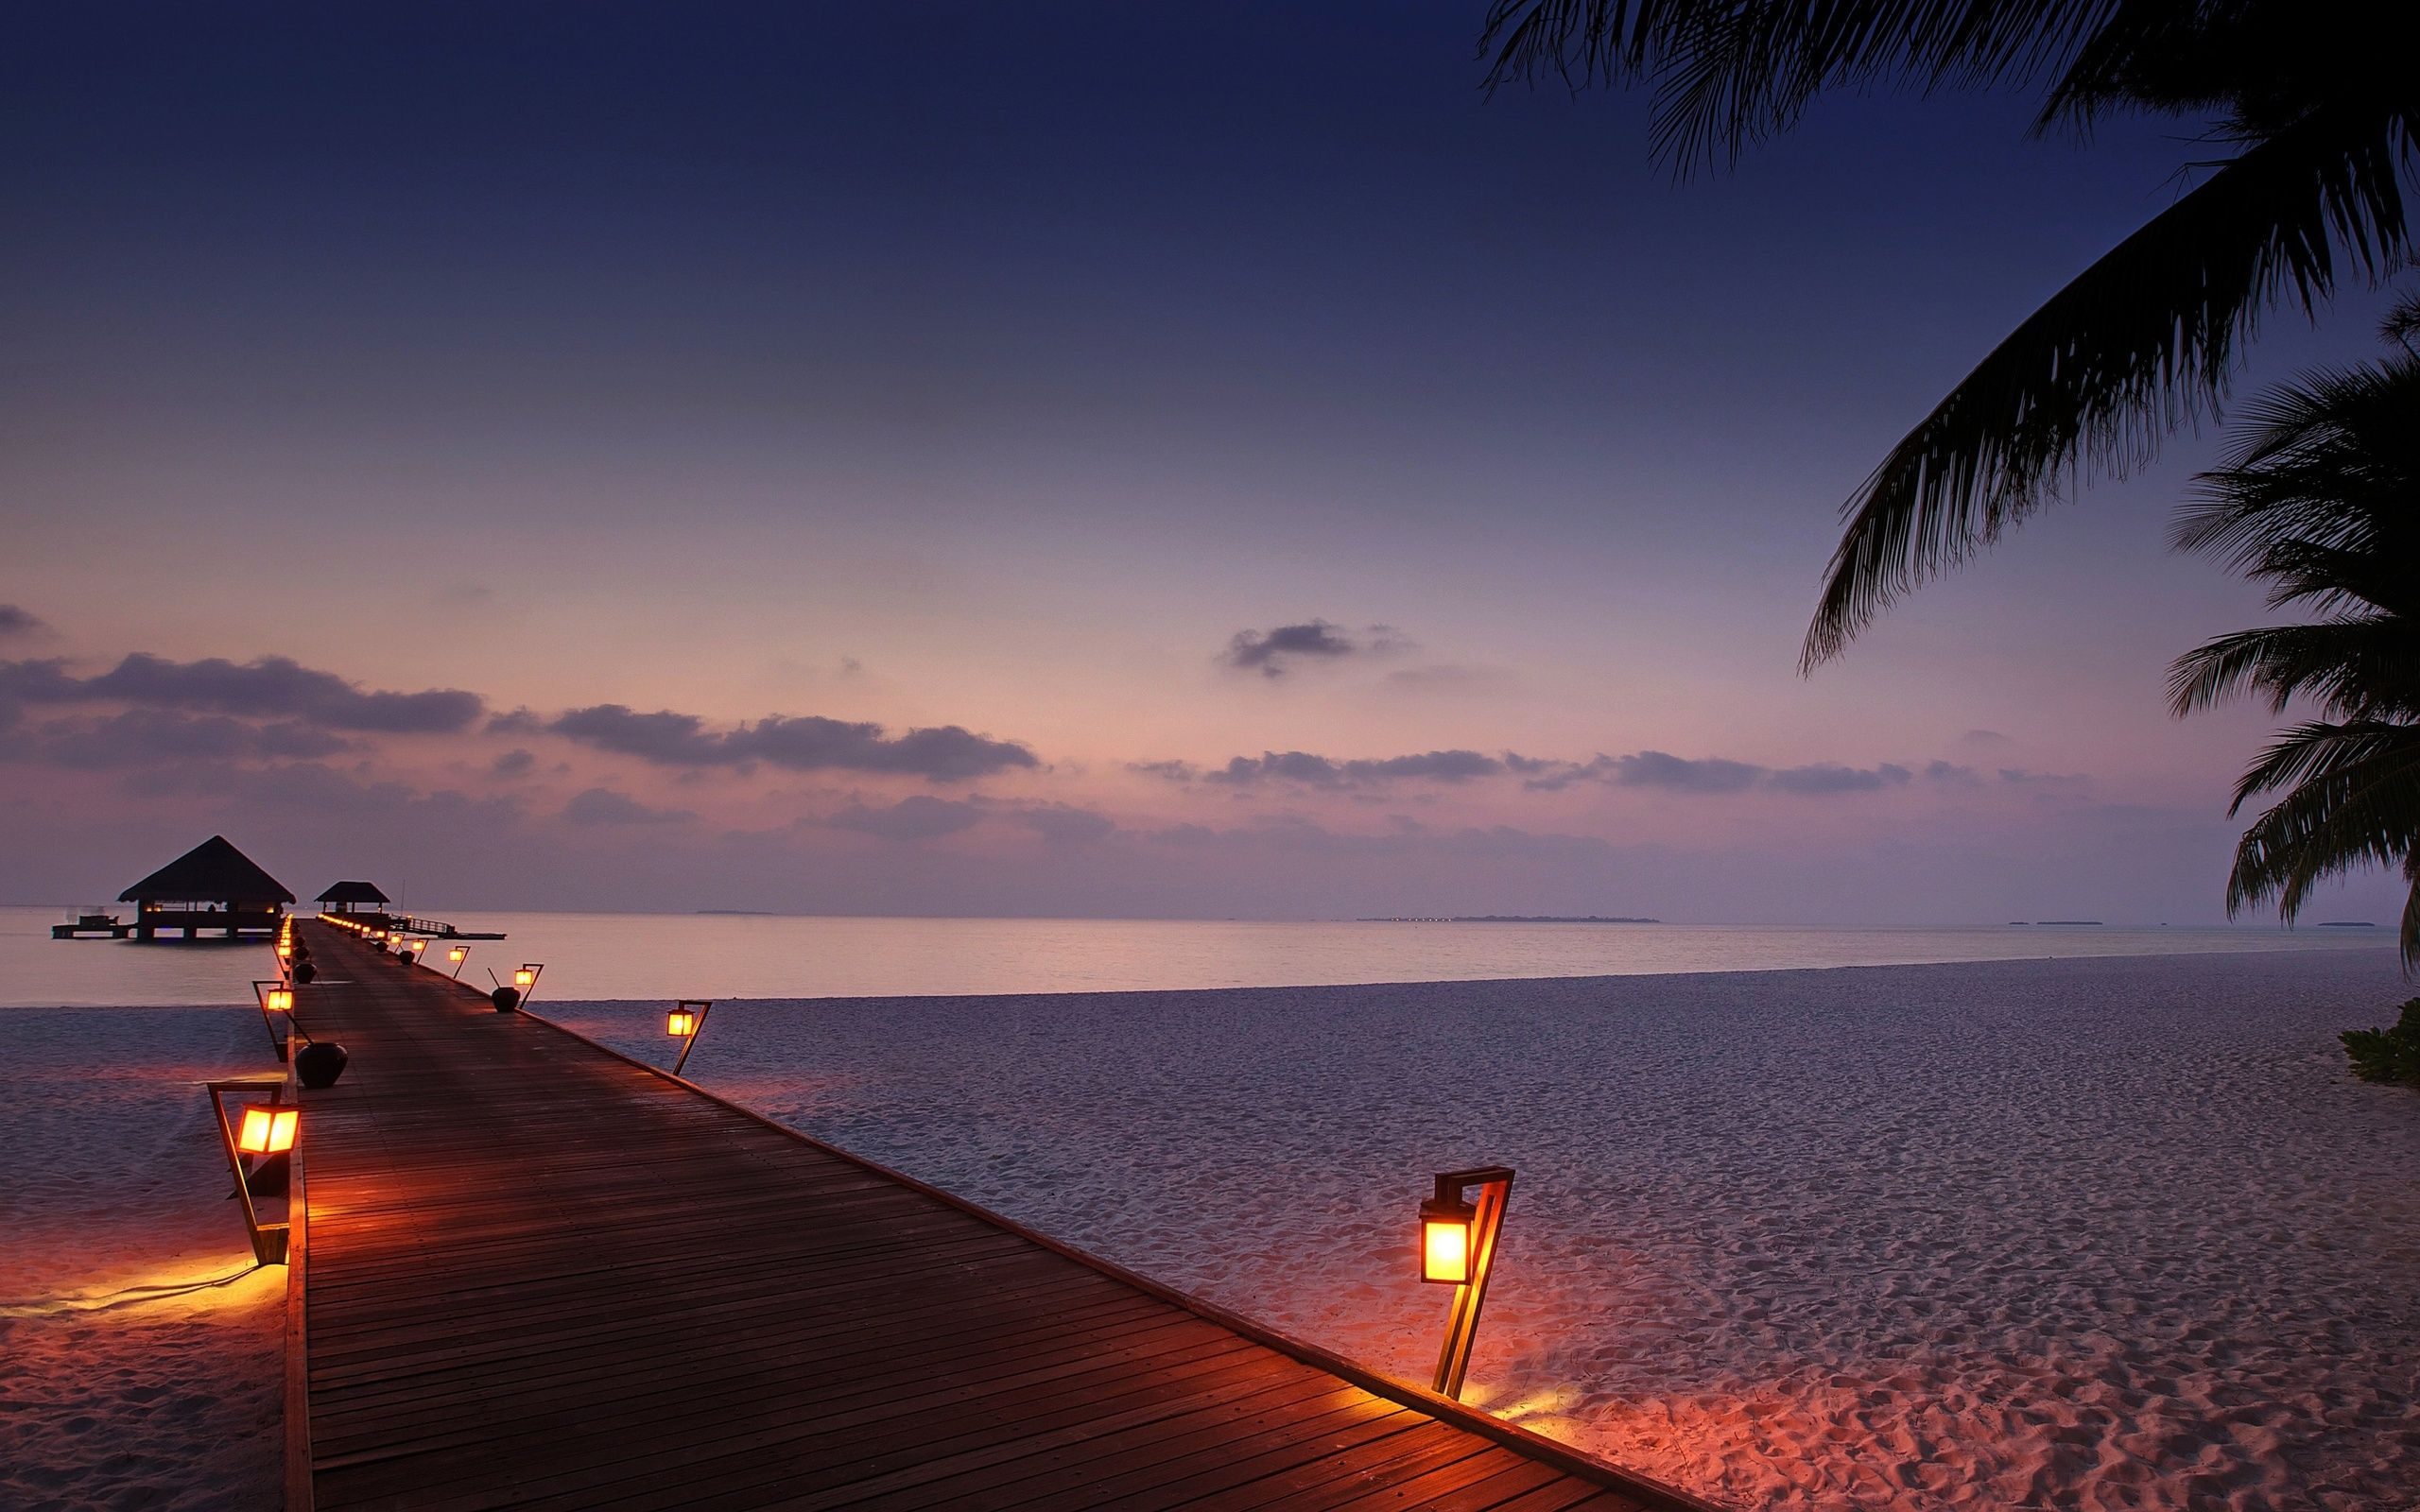 Maldives Beautiful Beach Top reddit wallpapers Pinterest